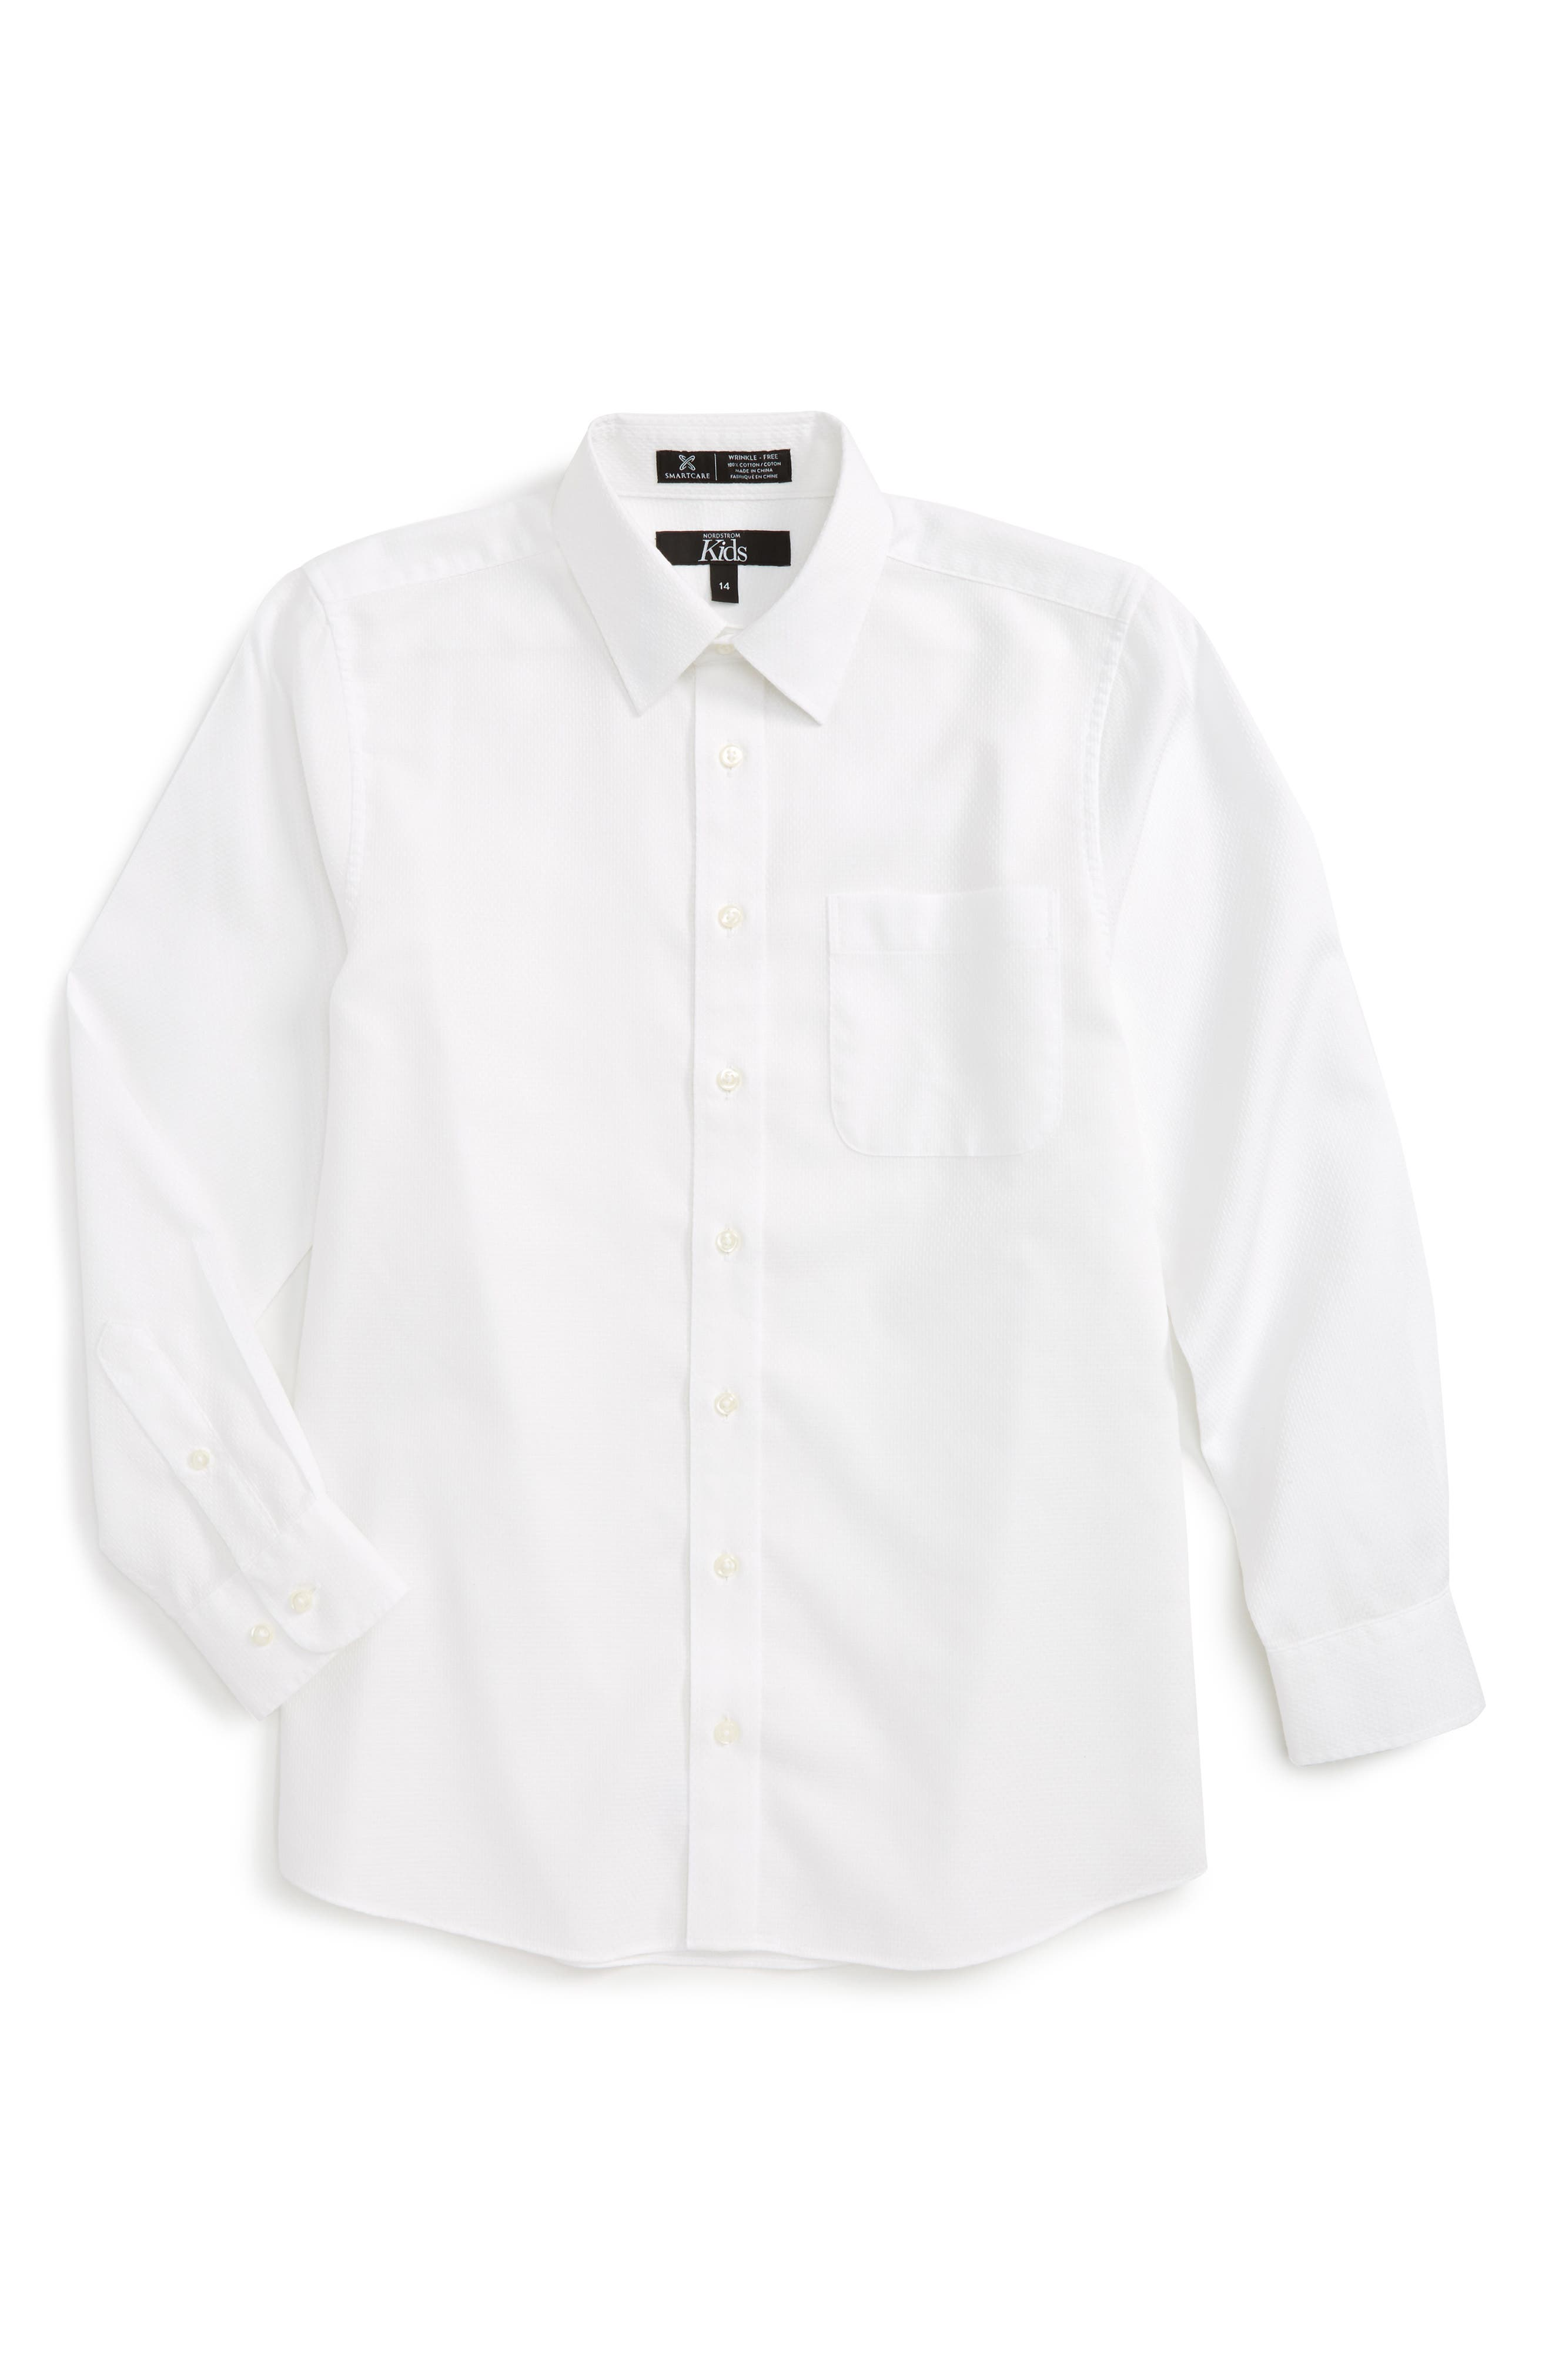 Smartcare<sup>™</sup> Honeycomb Dress Shirt,                         Main,                         color, 100